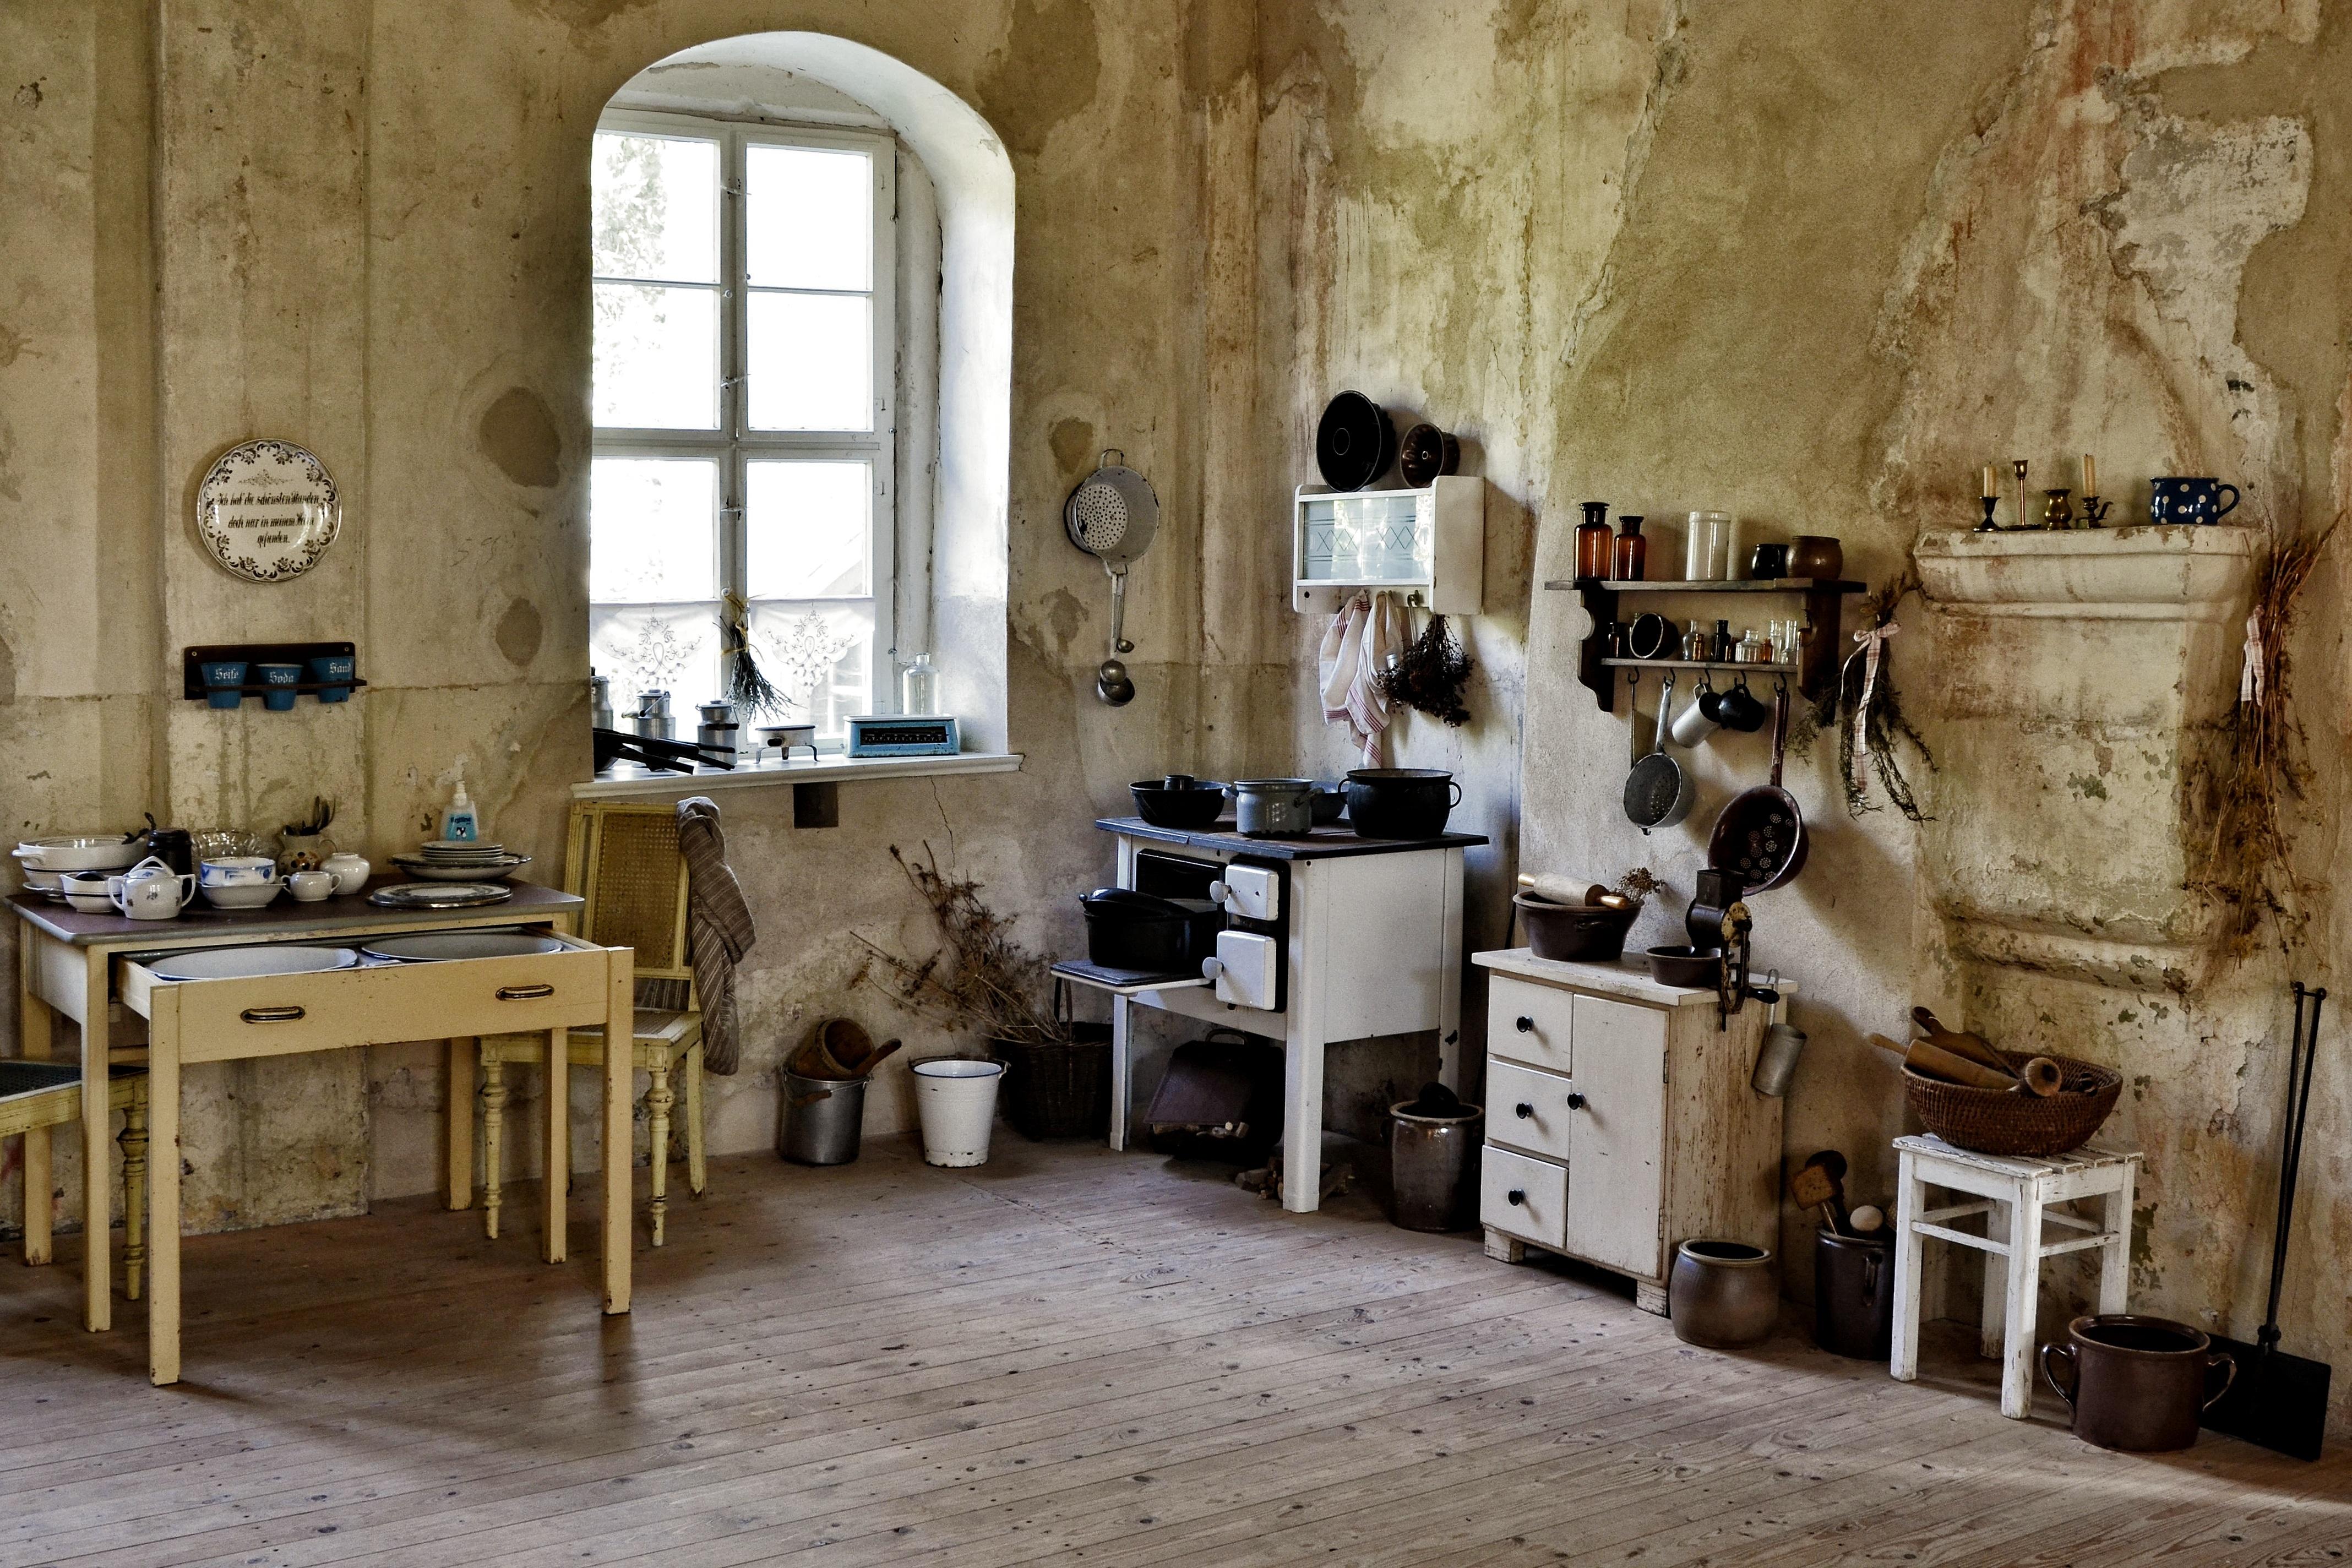 Fotos gratis : mesa, madera, vendimia, casa, piso, antiguo, lavabo ...